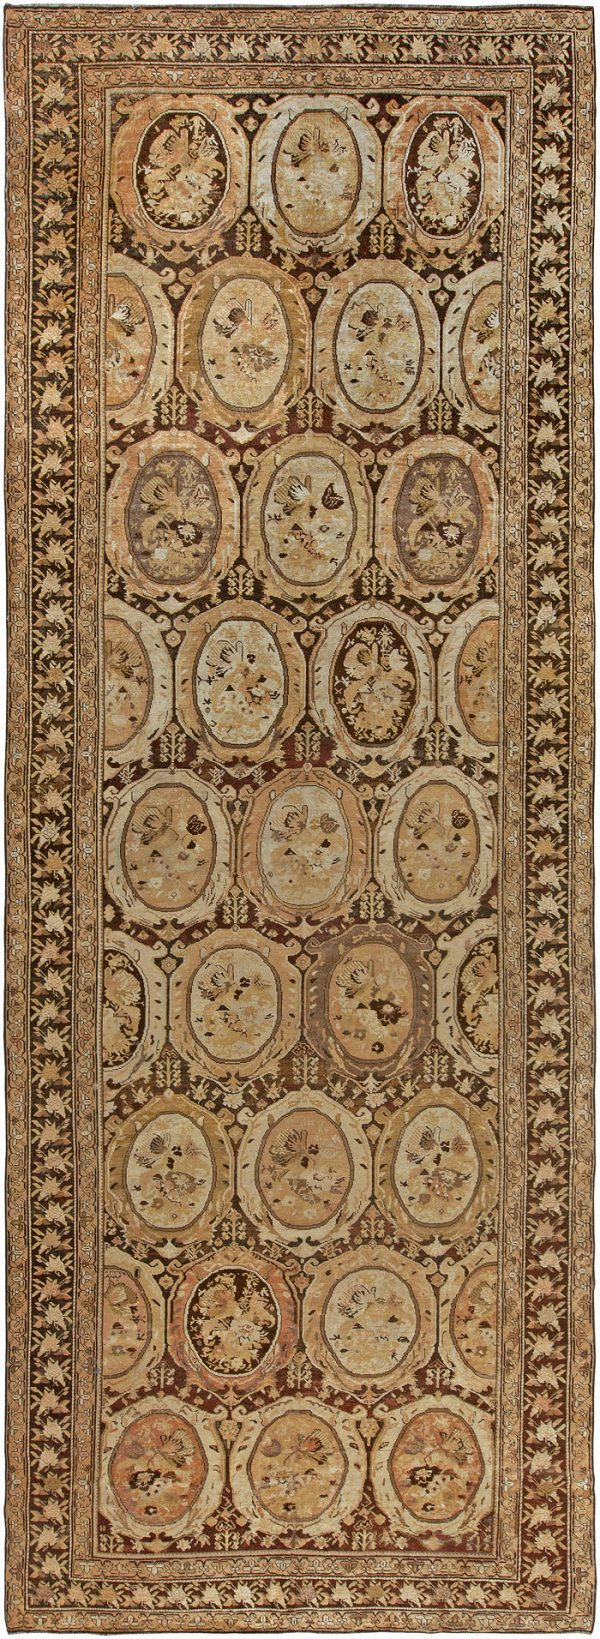 Antique Caucasian Karabagh Carpet BB0958